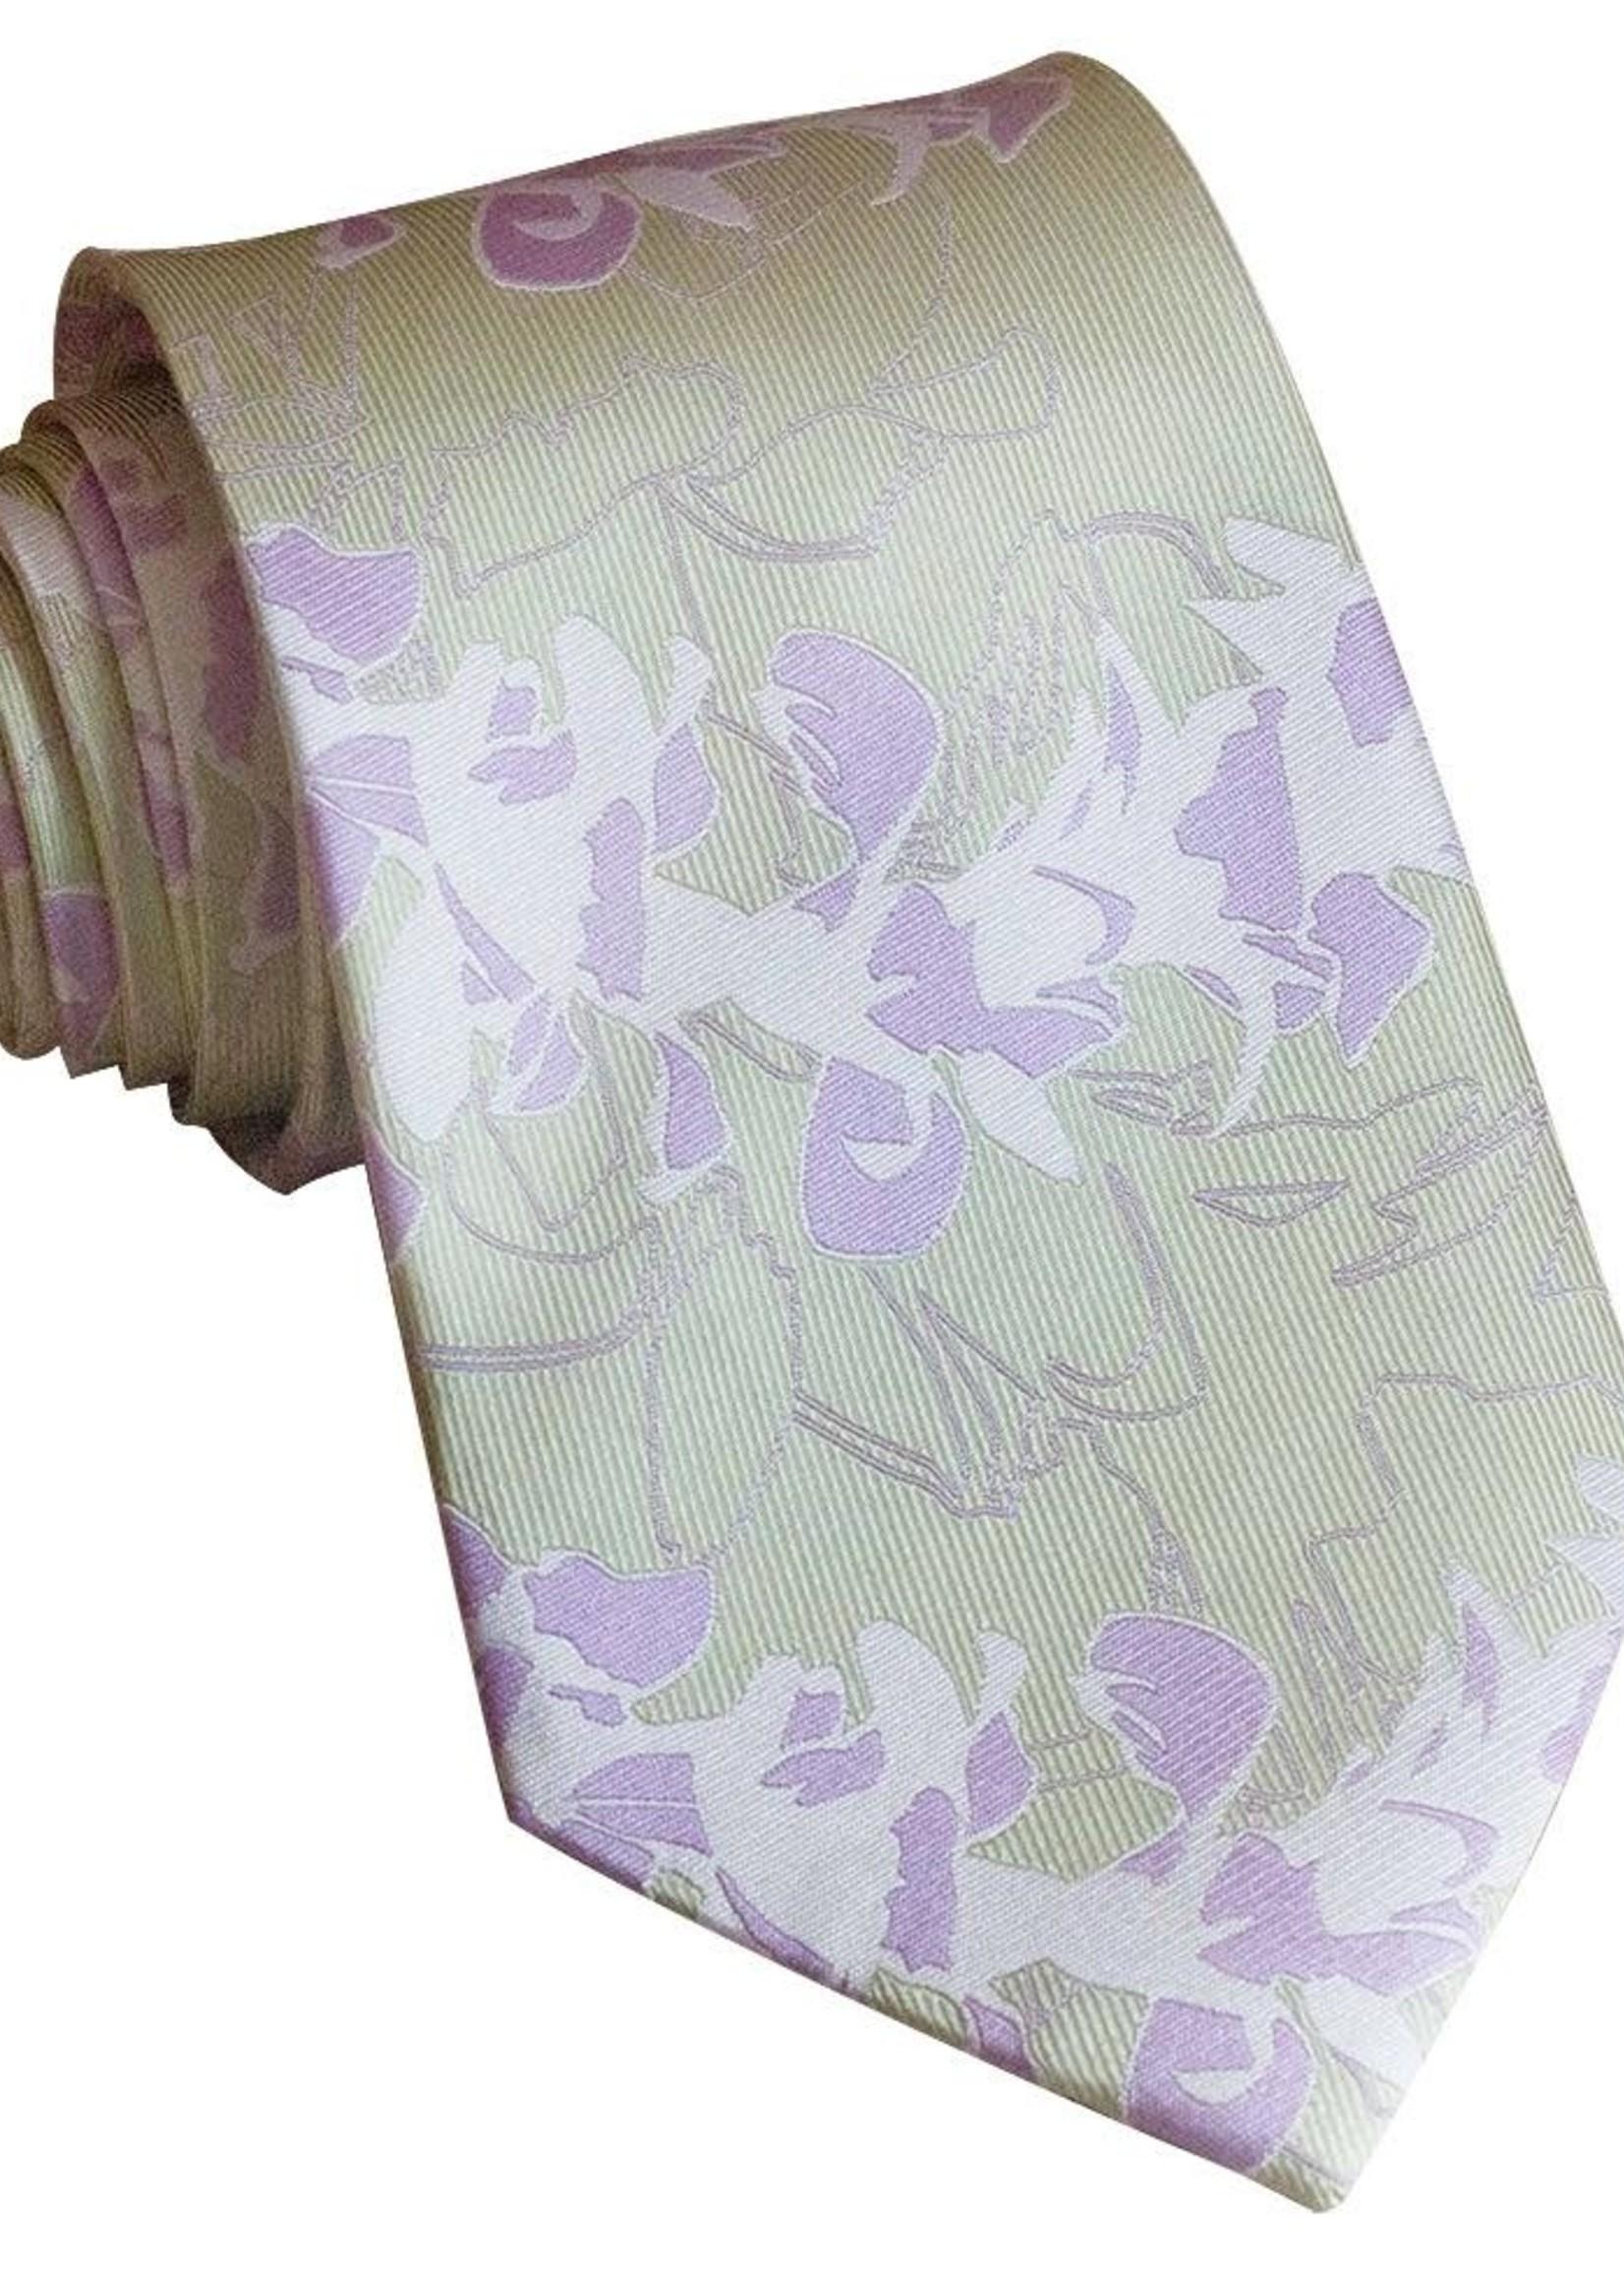 Pineapple Palaka Pineapple Palaka Ties -  Orchid Lei EXECUTIVE Necktie